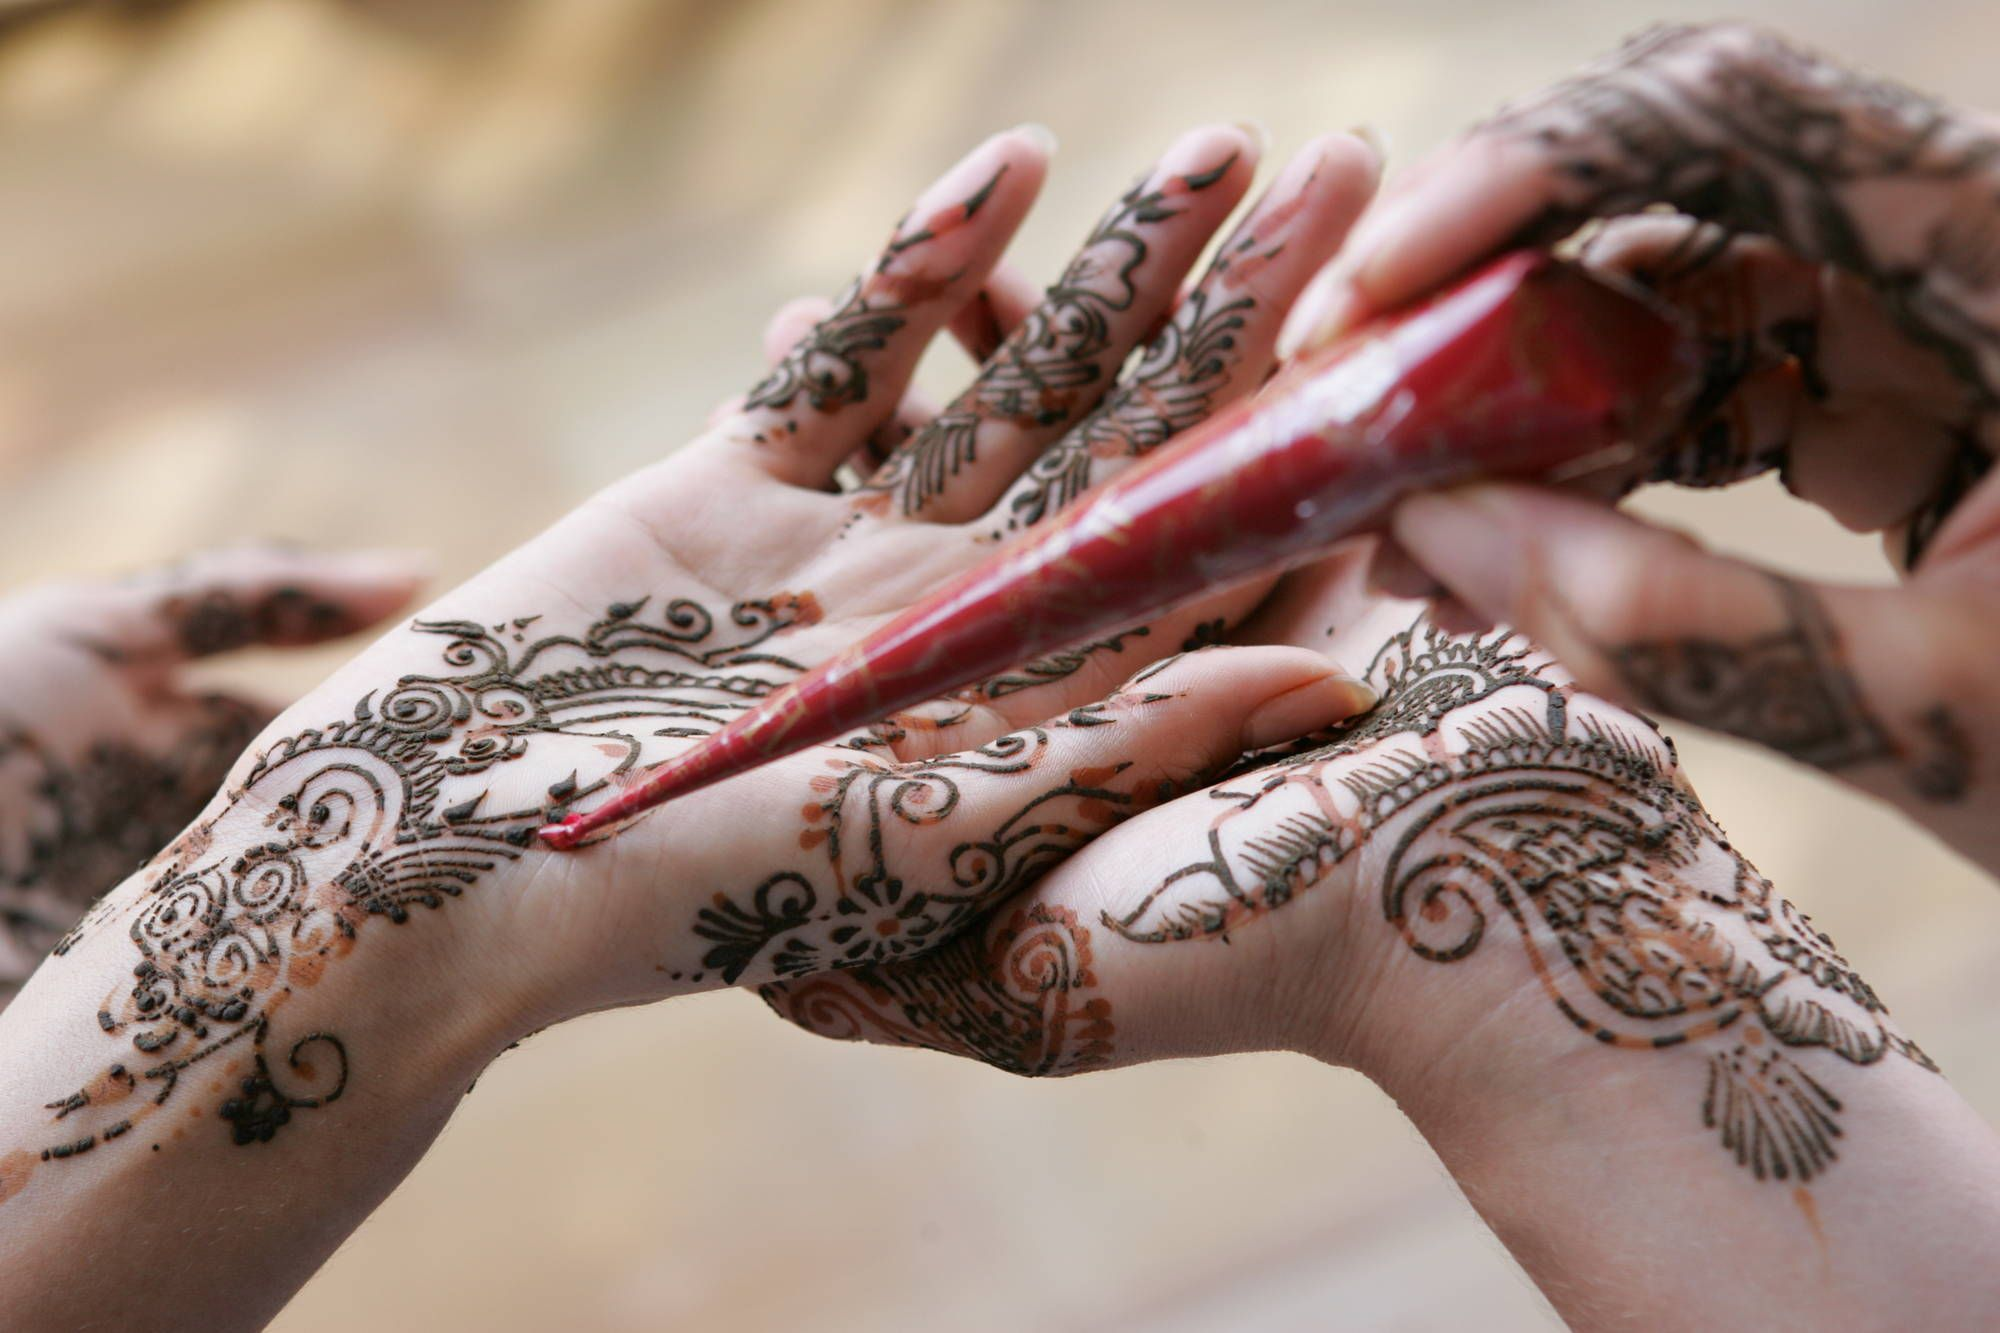 History of Henna (With images) Henna, Henna kit, Henna